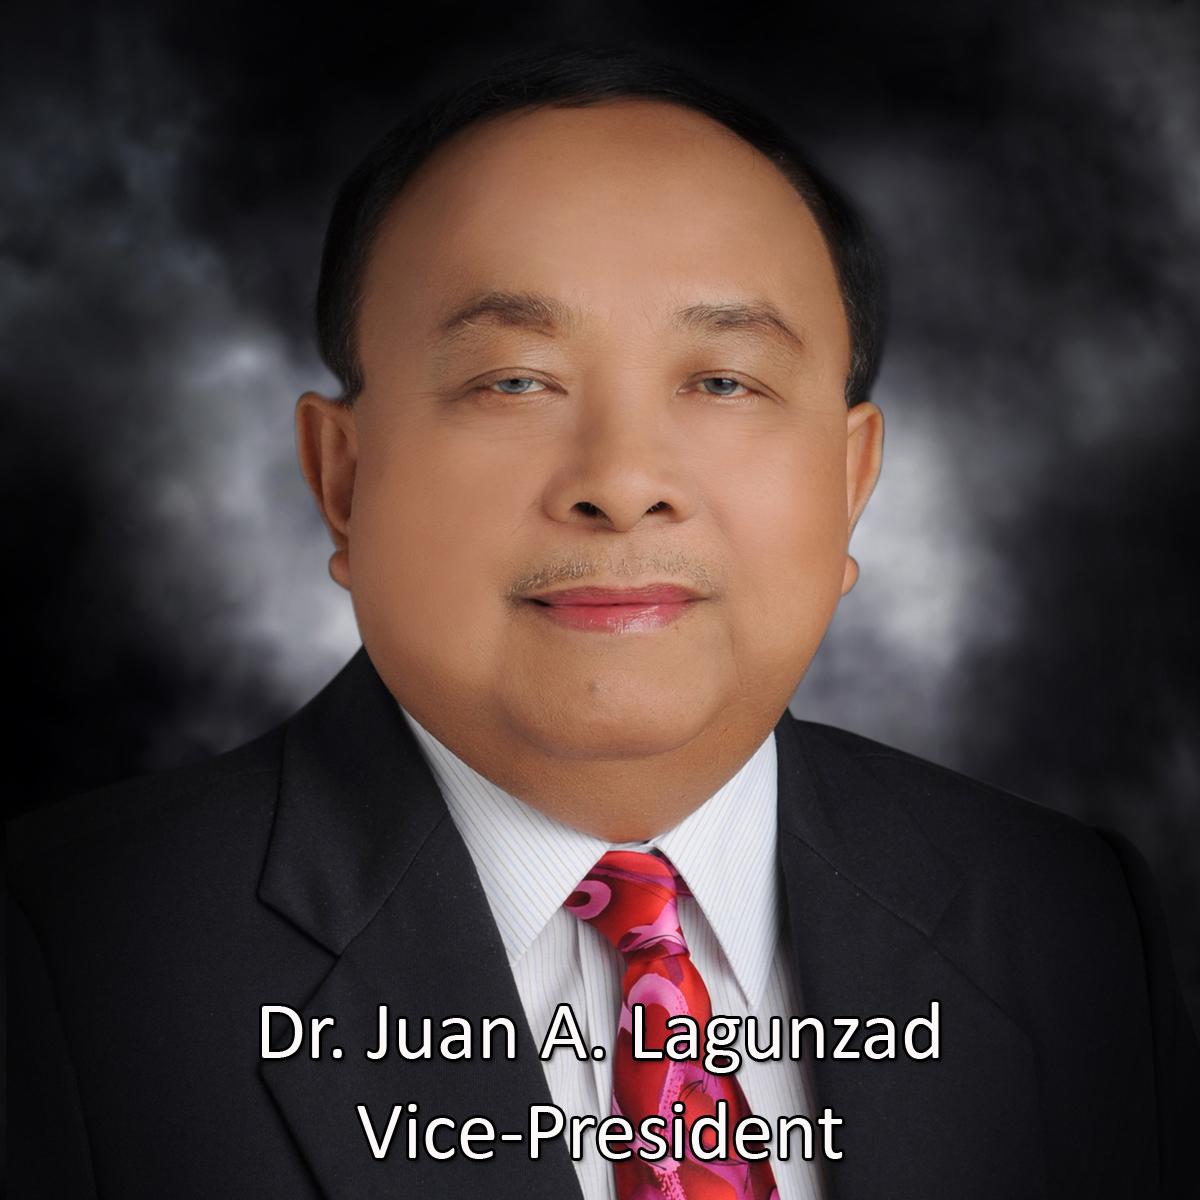 003DrJuanLagunzad_VicePresident